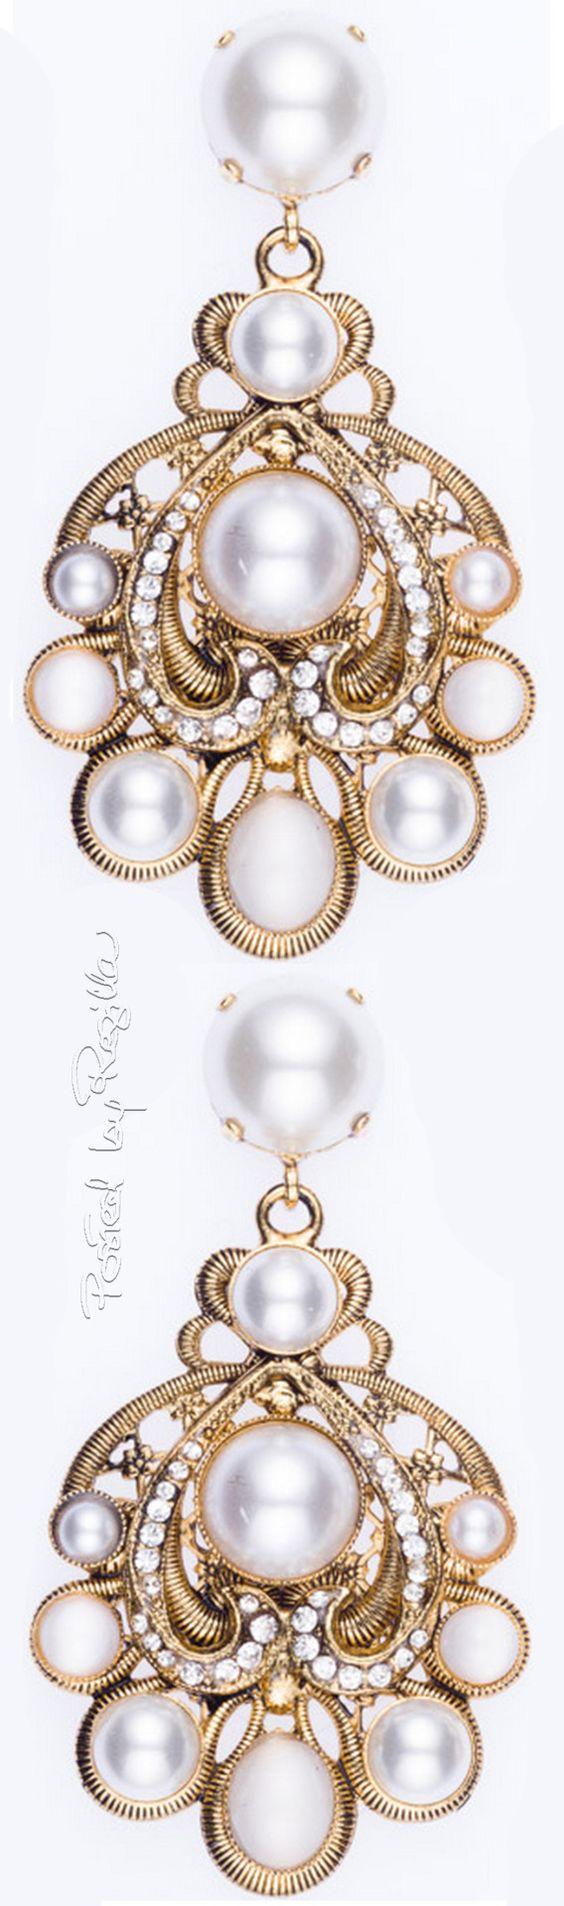 fashion jewellery antique rosamaria g frangini